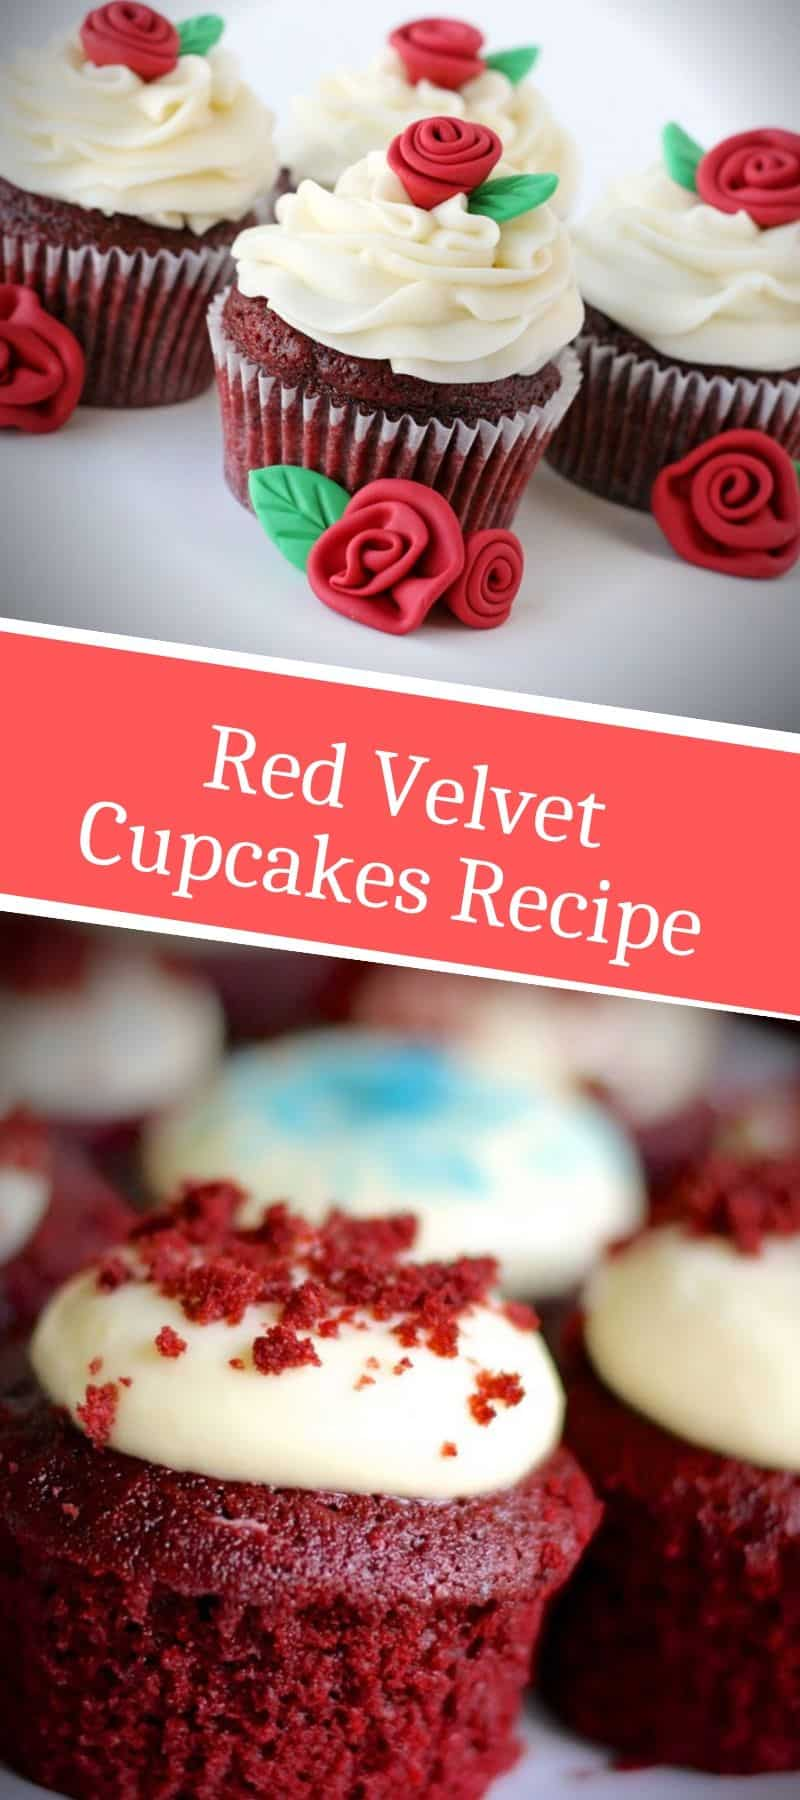 Red Velvet Cupcakes Recipe 3